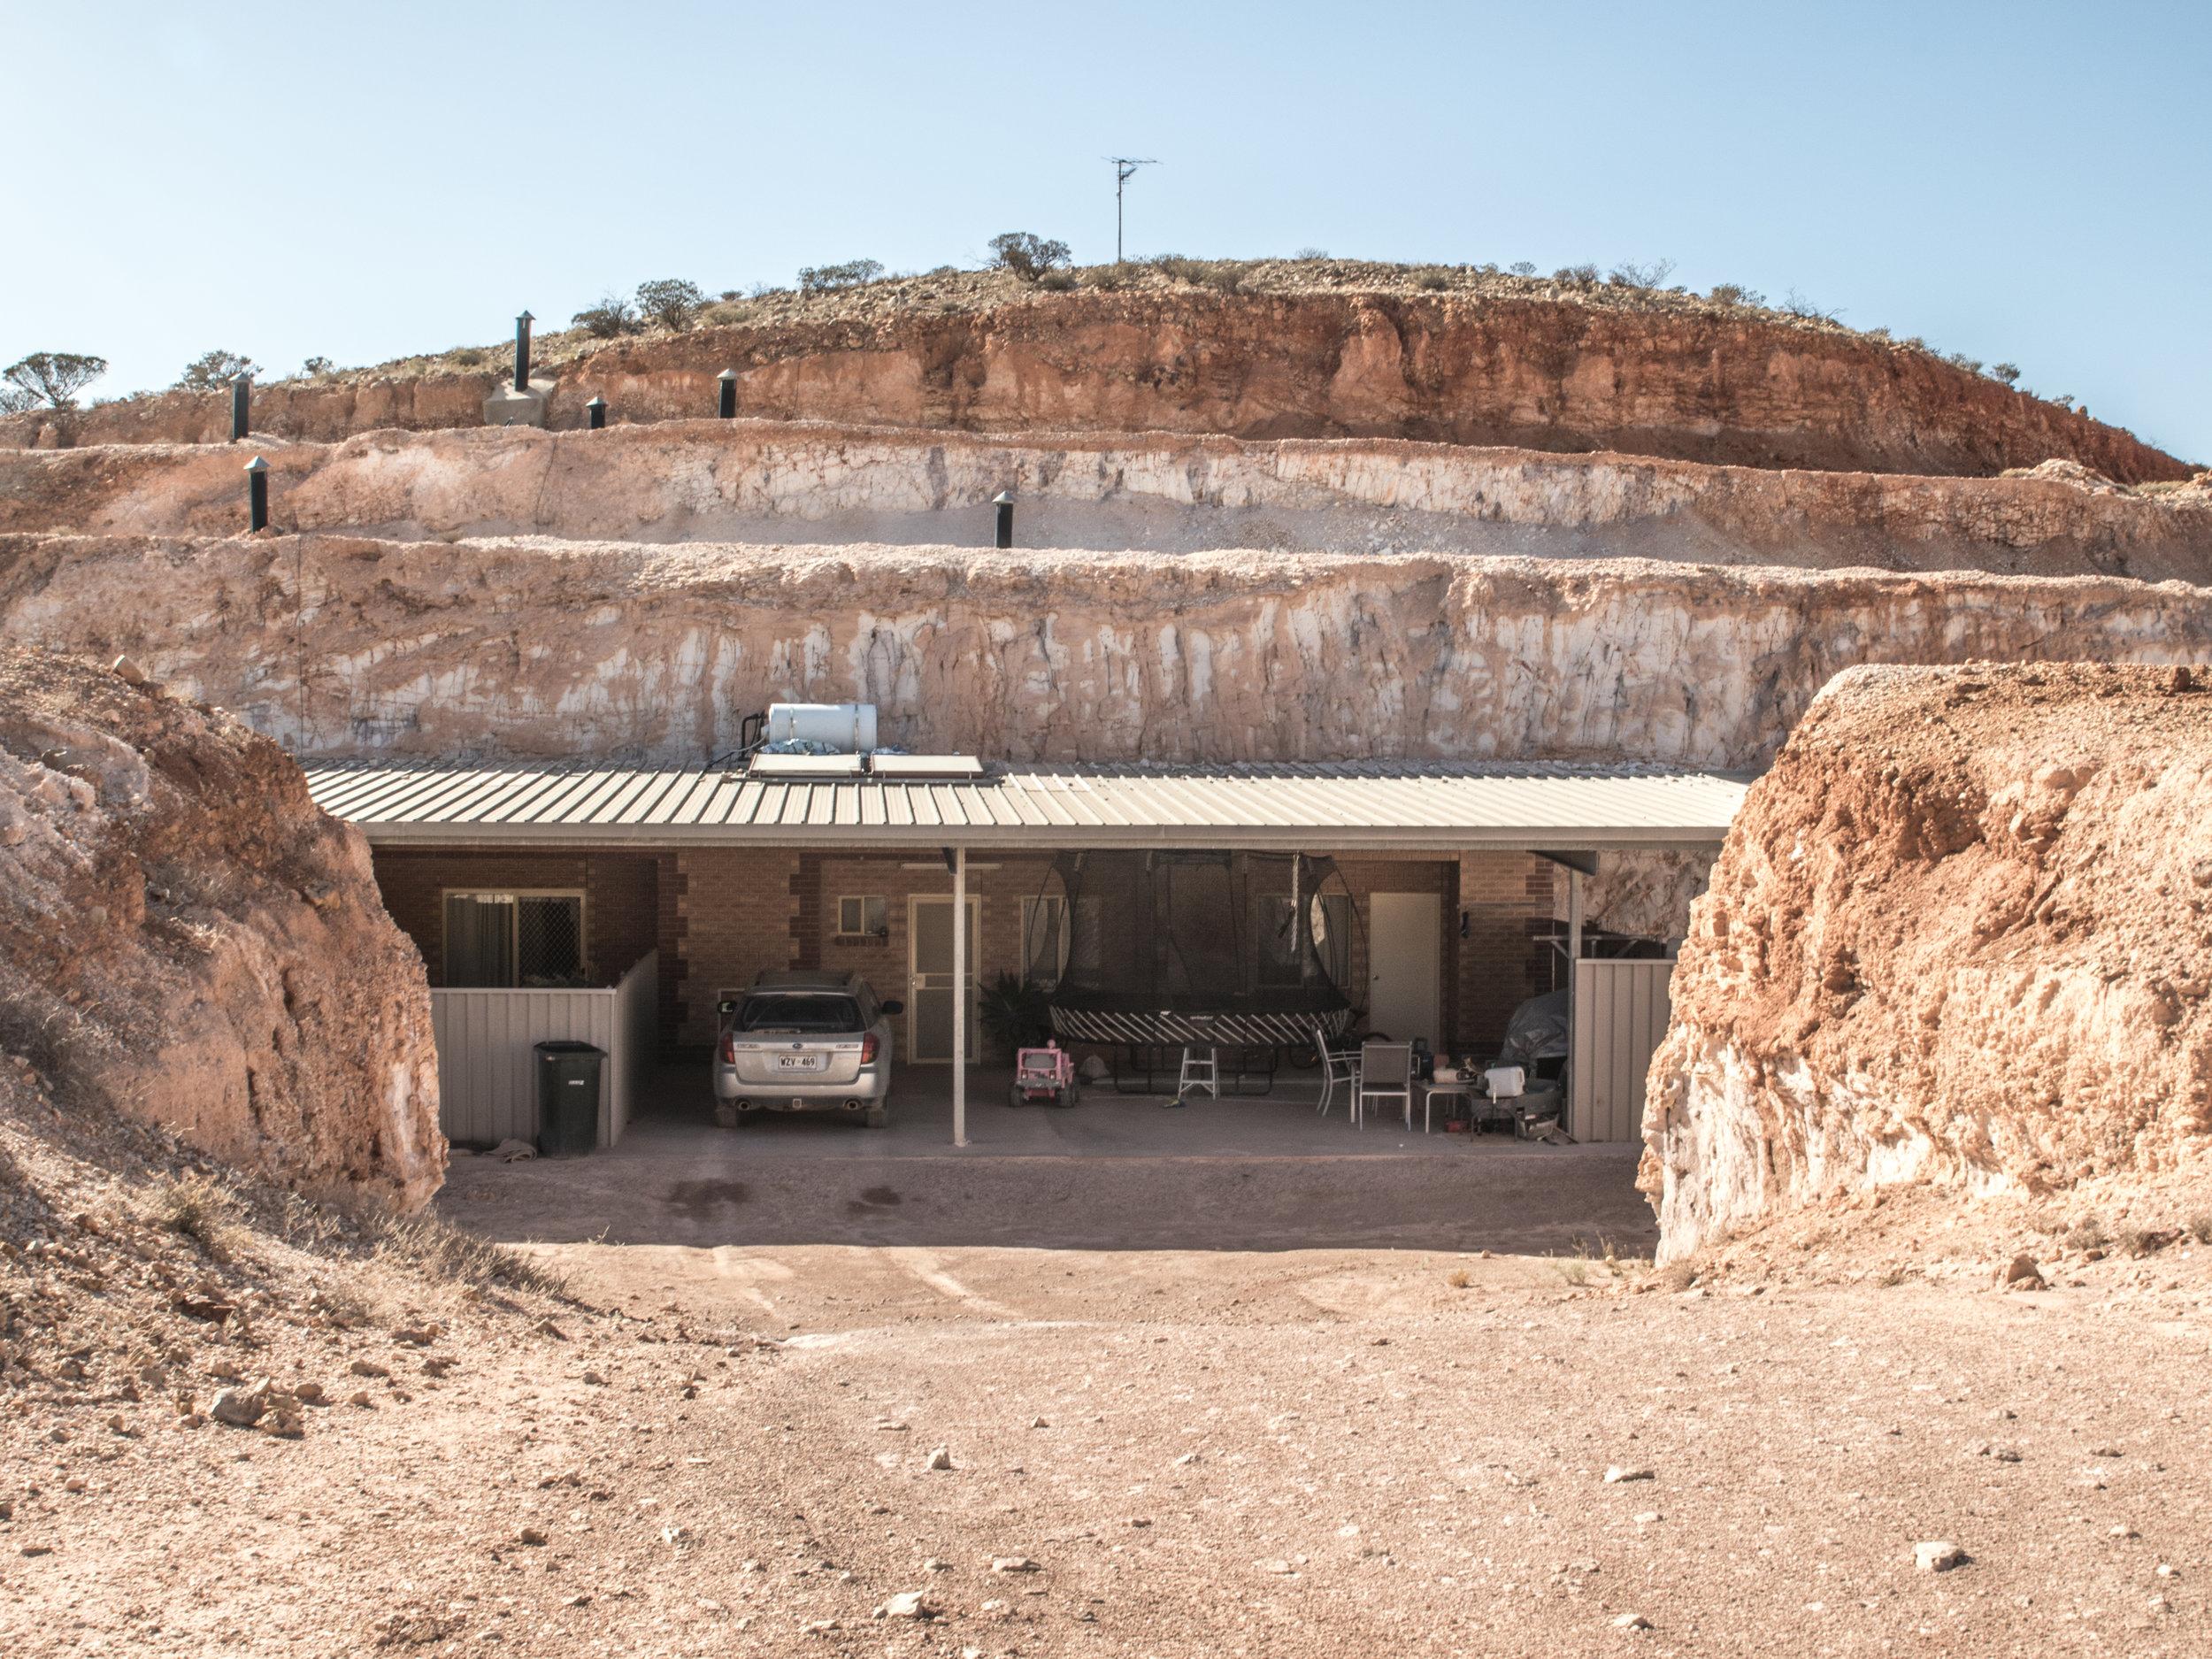 Fachada de una vivienda subterránea en Coober Pedy (Australia). ANA GONZÁLEZ